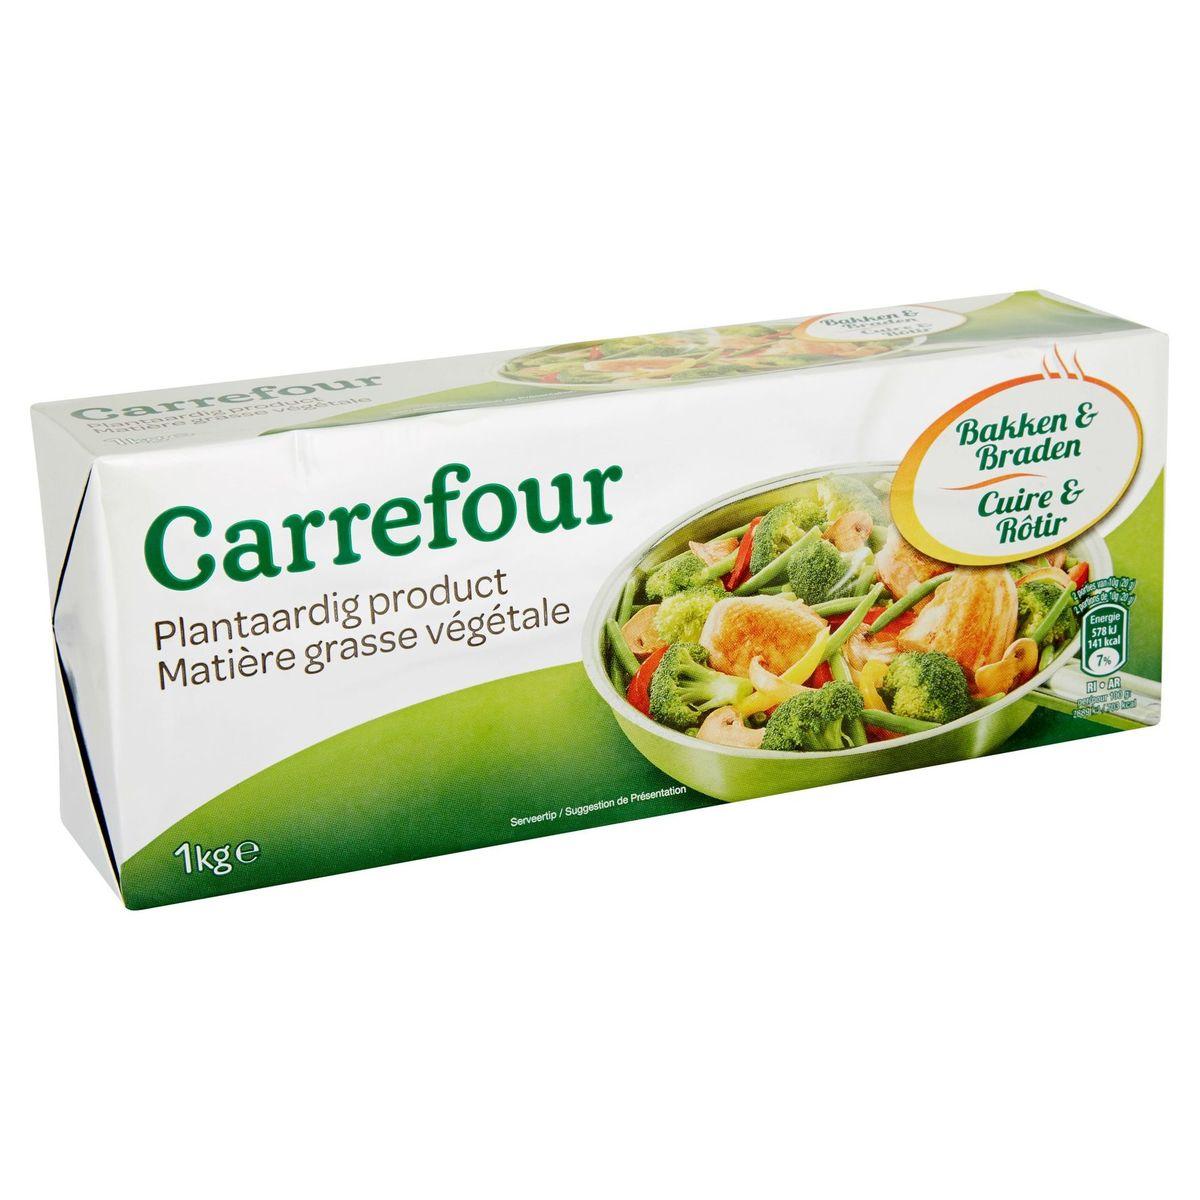 Carrefour Plantaardig Product Bakken & Braden 1 kg